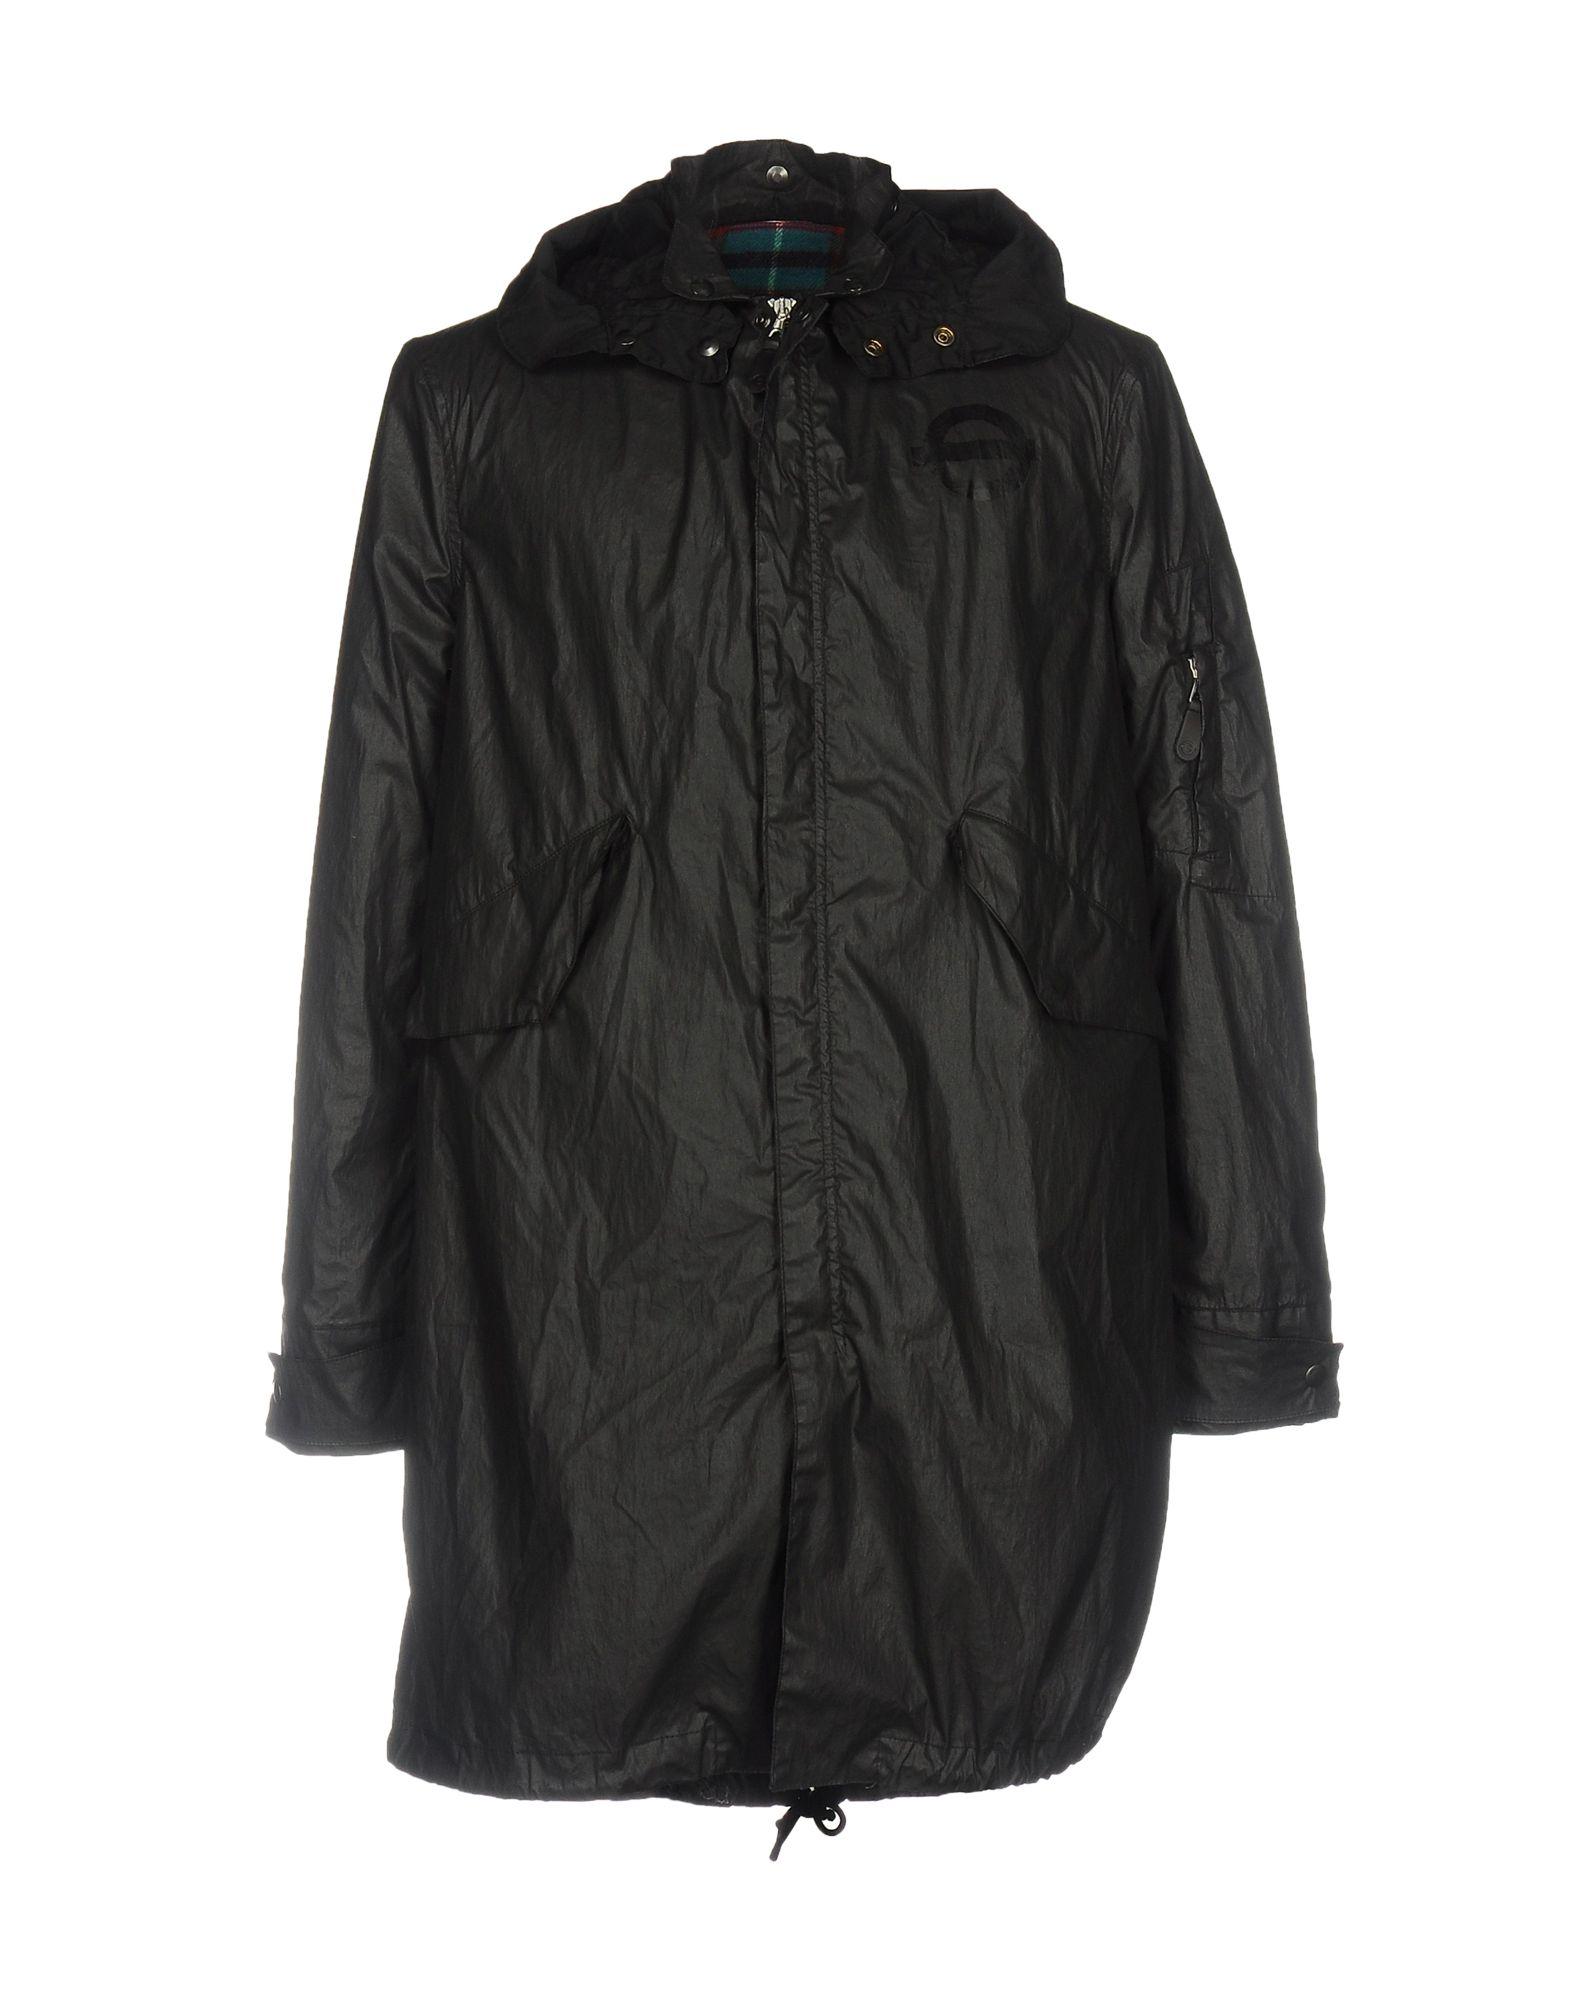 ROUNDEL LONDON Jacket in Black